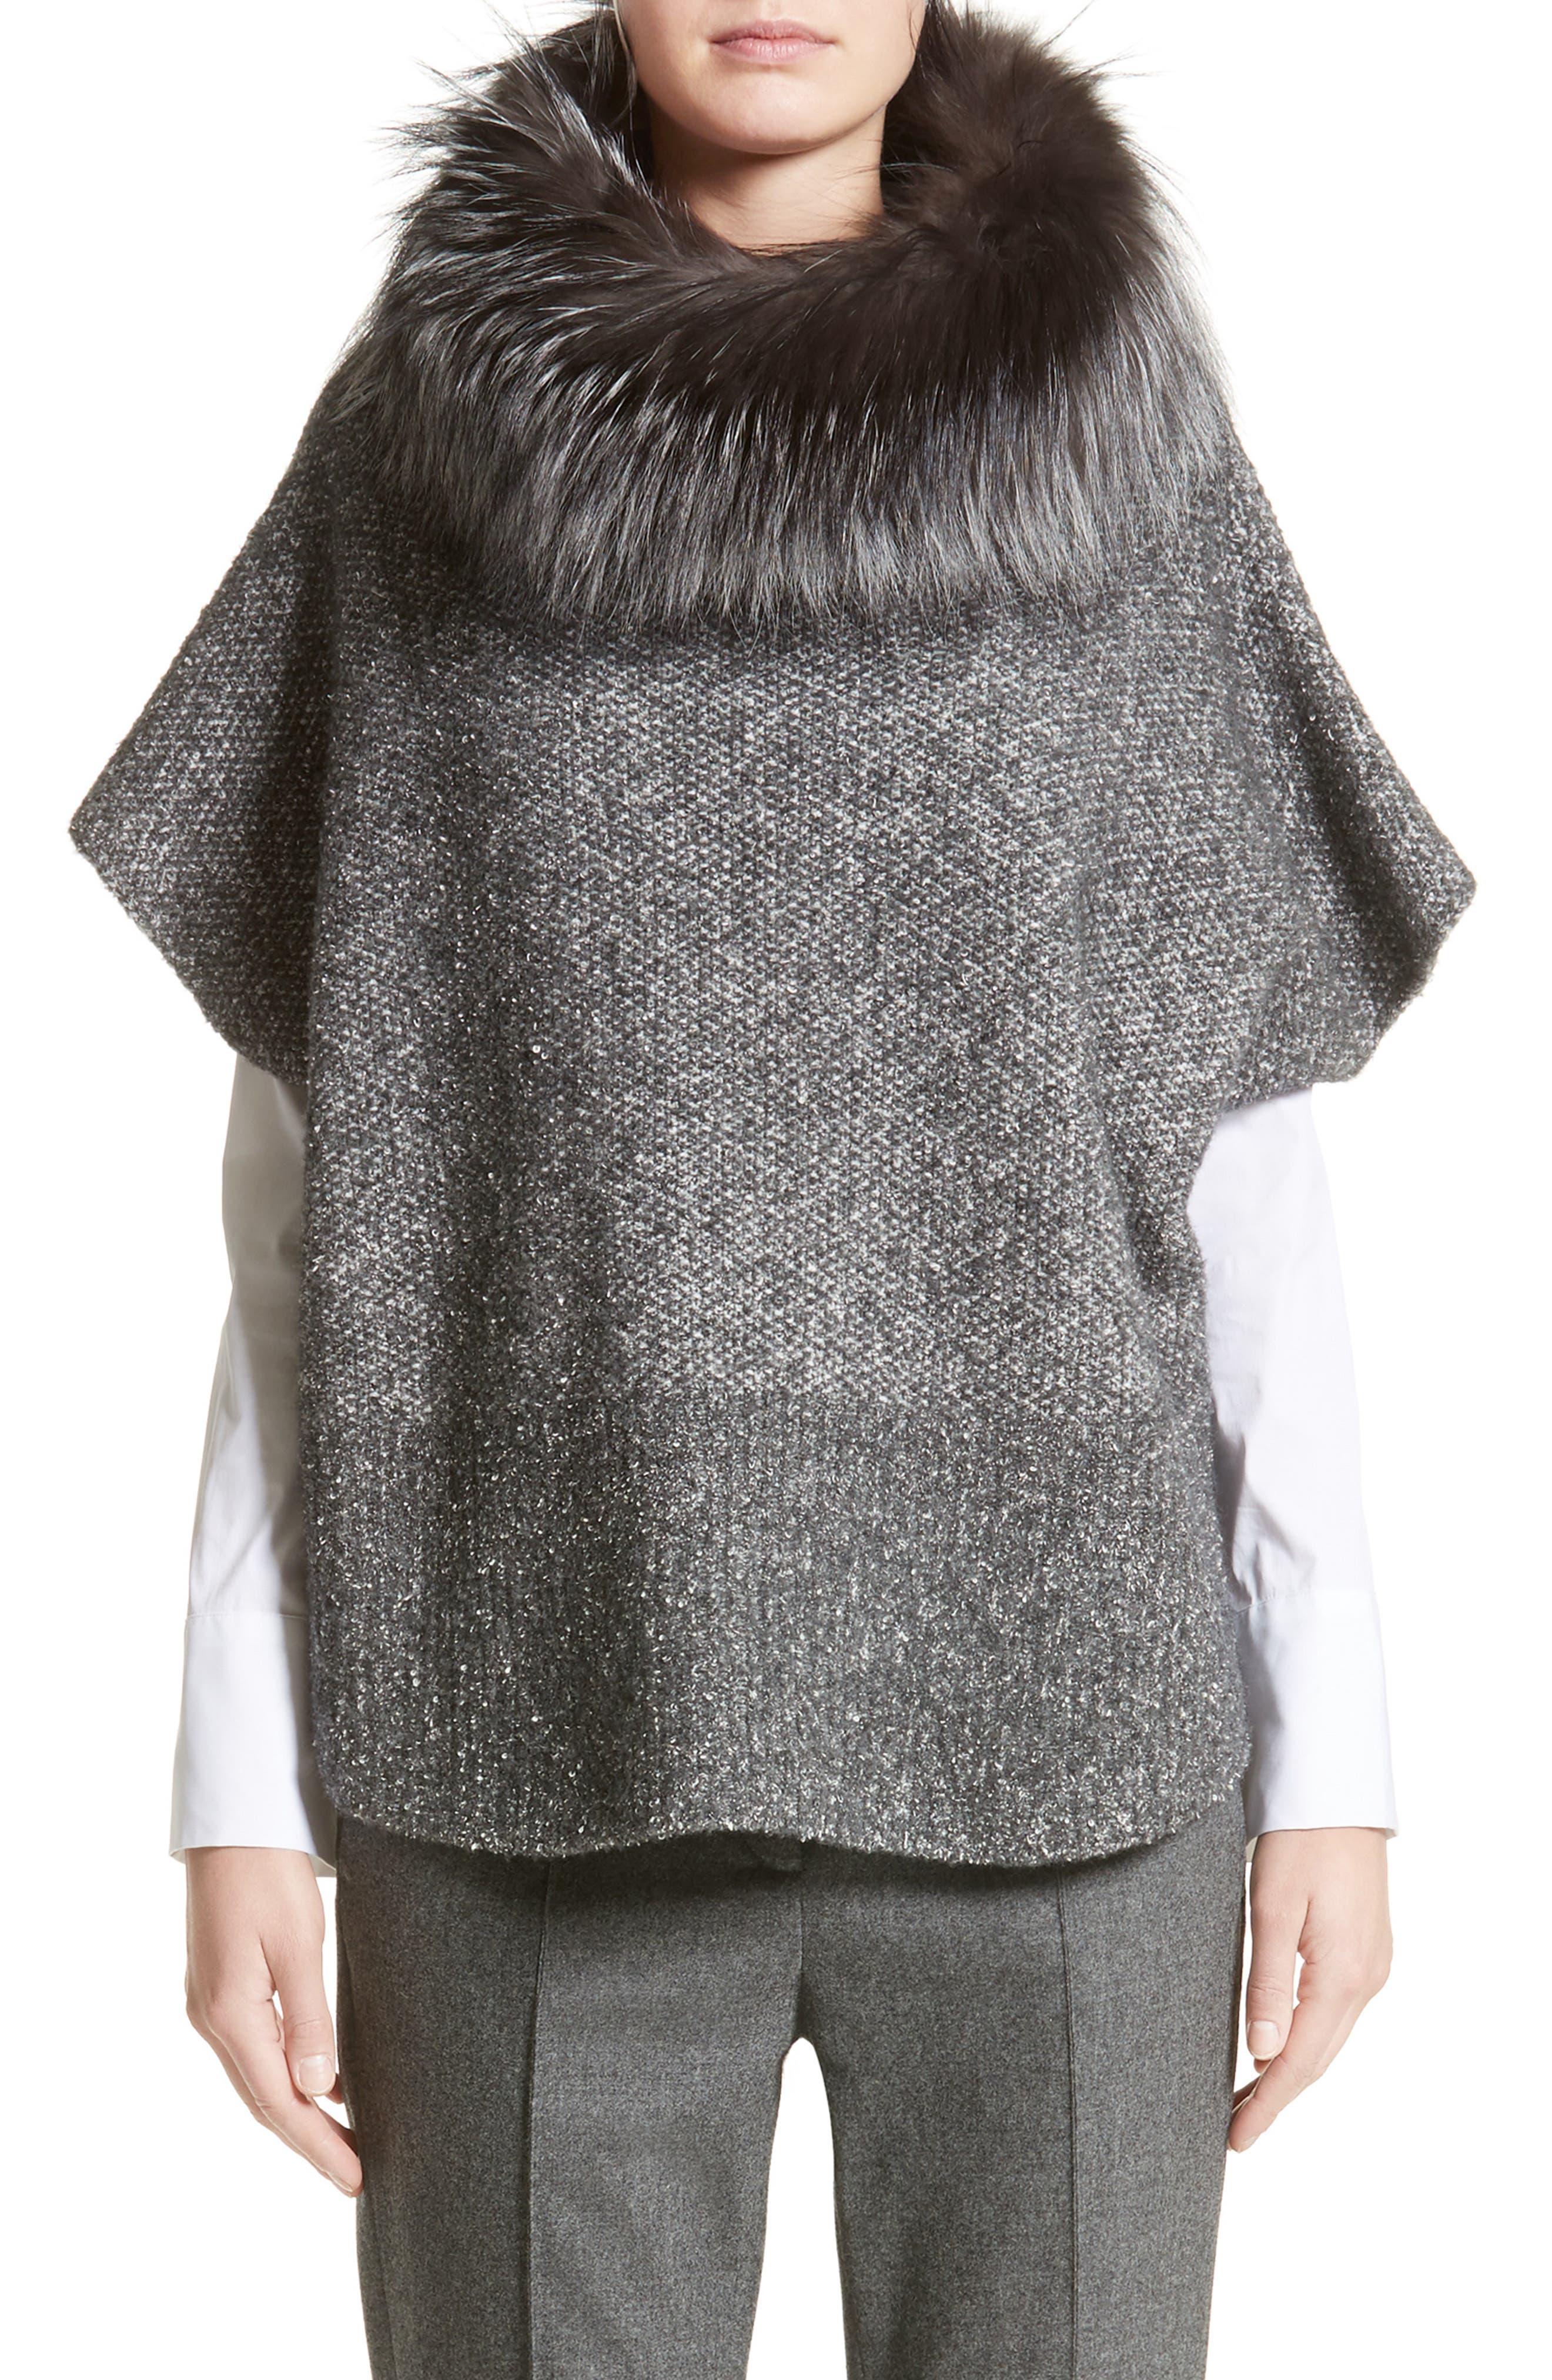 Pebble Tweed Knit Poncho with Genuine Fox Fur Collar,                         Main,                         color, 021